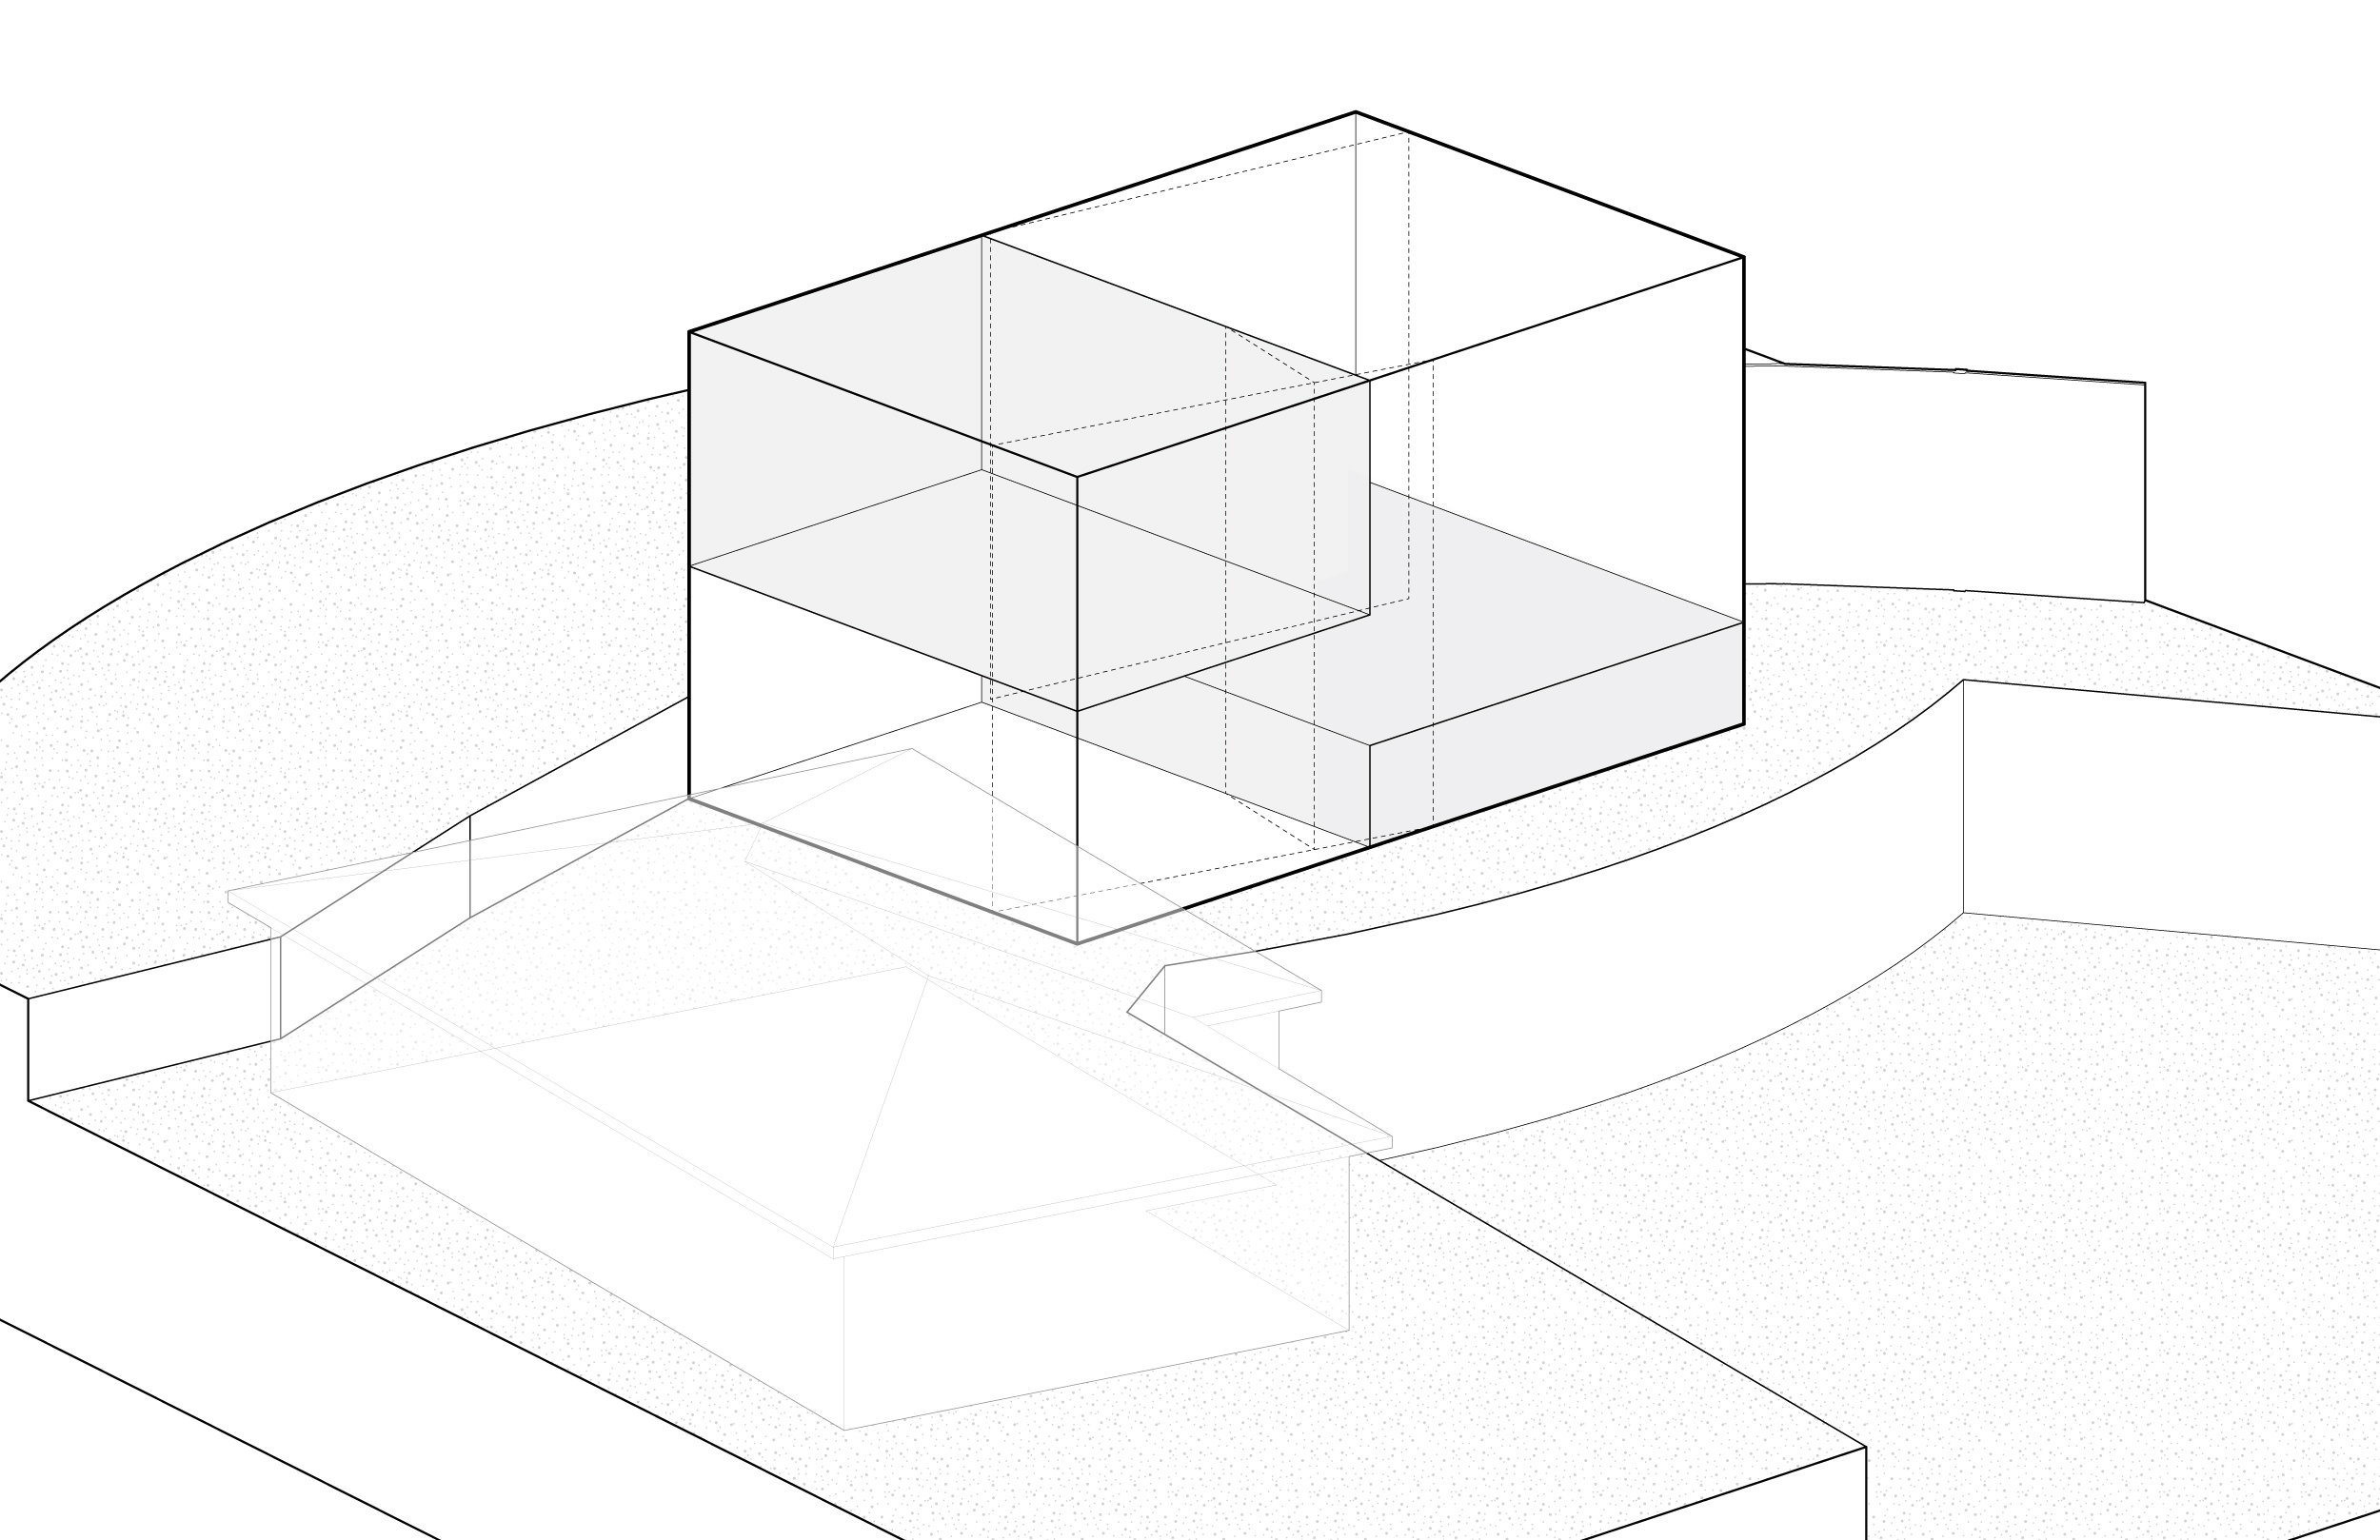 La-Cuesta-House_Diagram_03.jpg